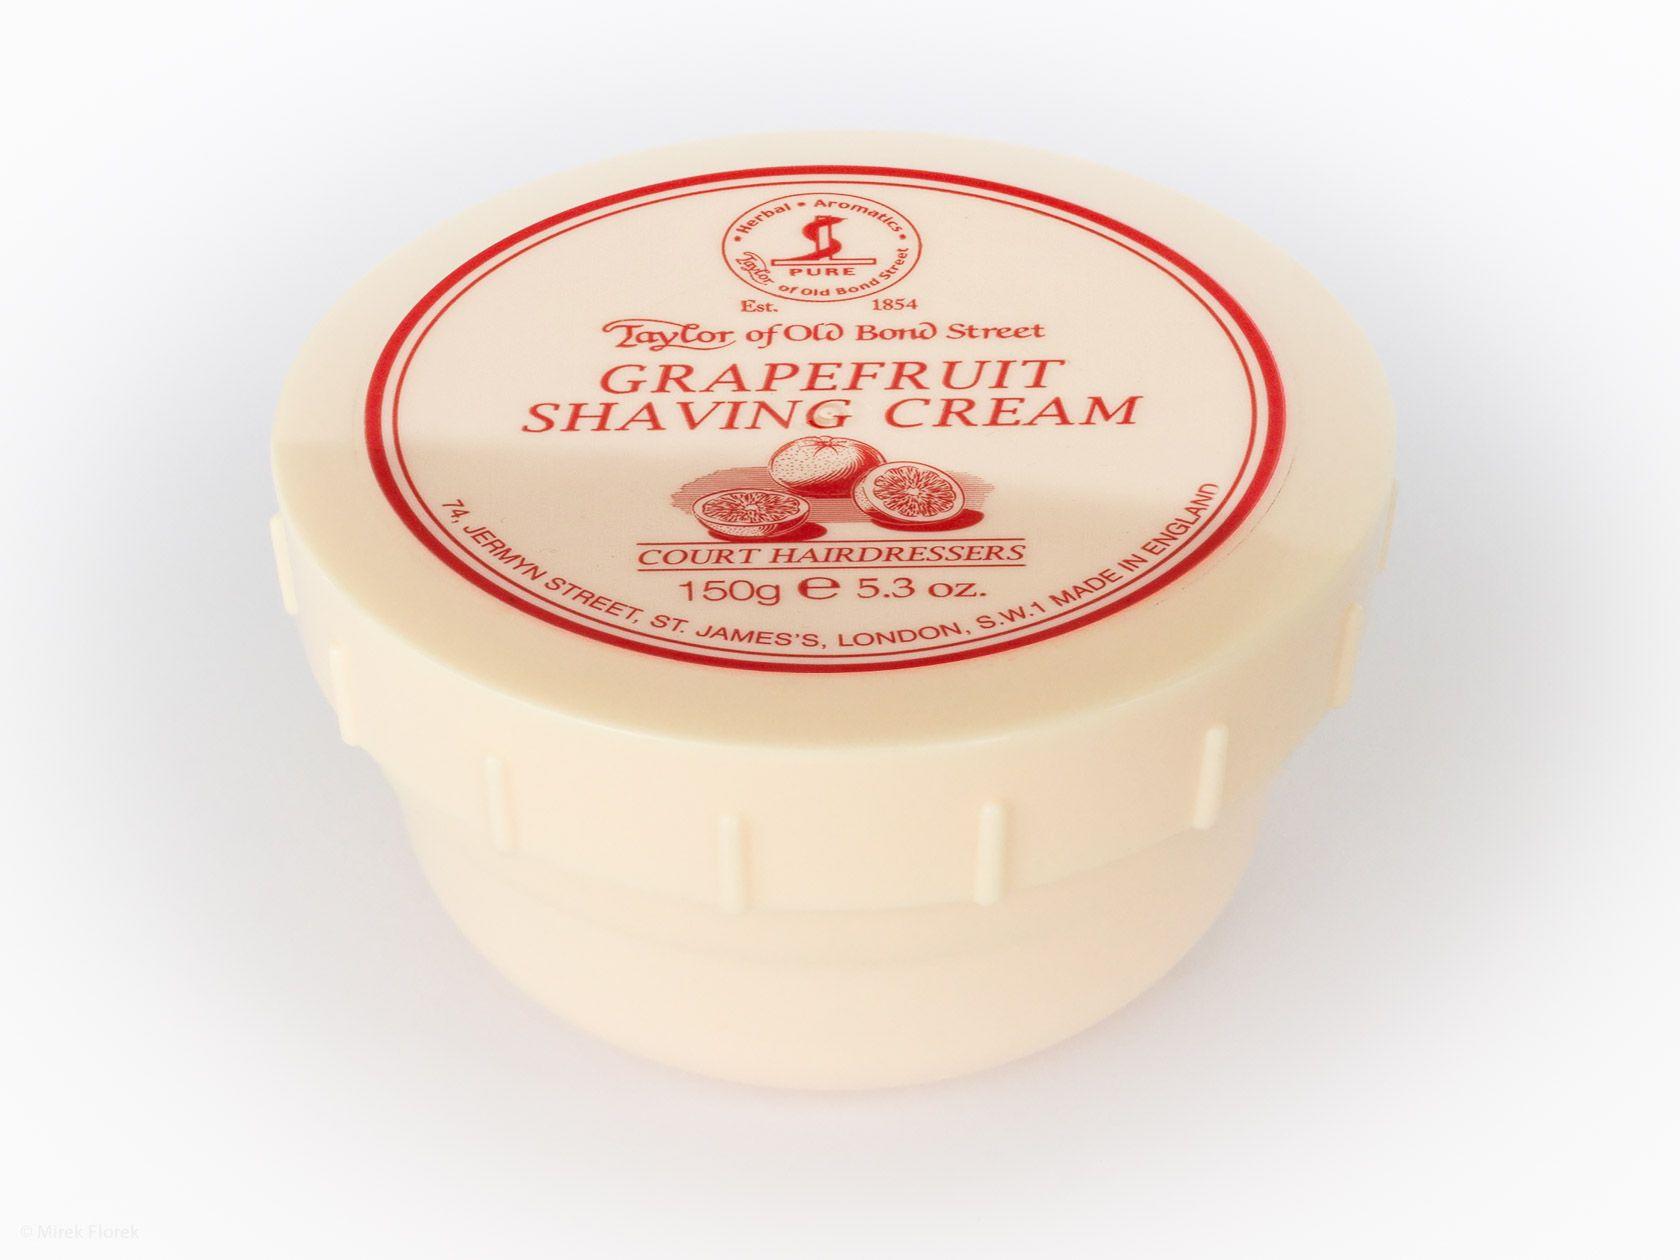 Opakowanie kremu do golenia Taylor of Old Bond Street Grapefruit Shaving Cream